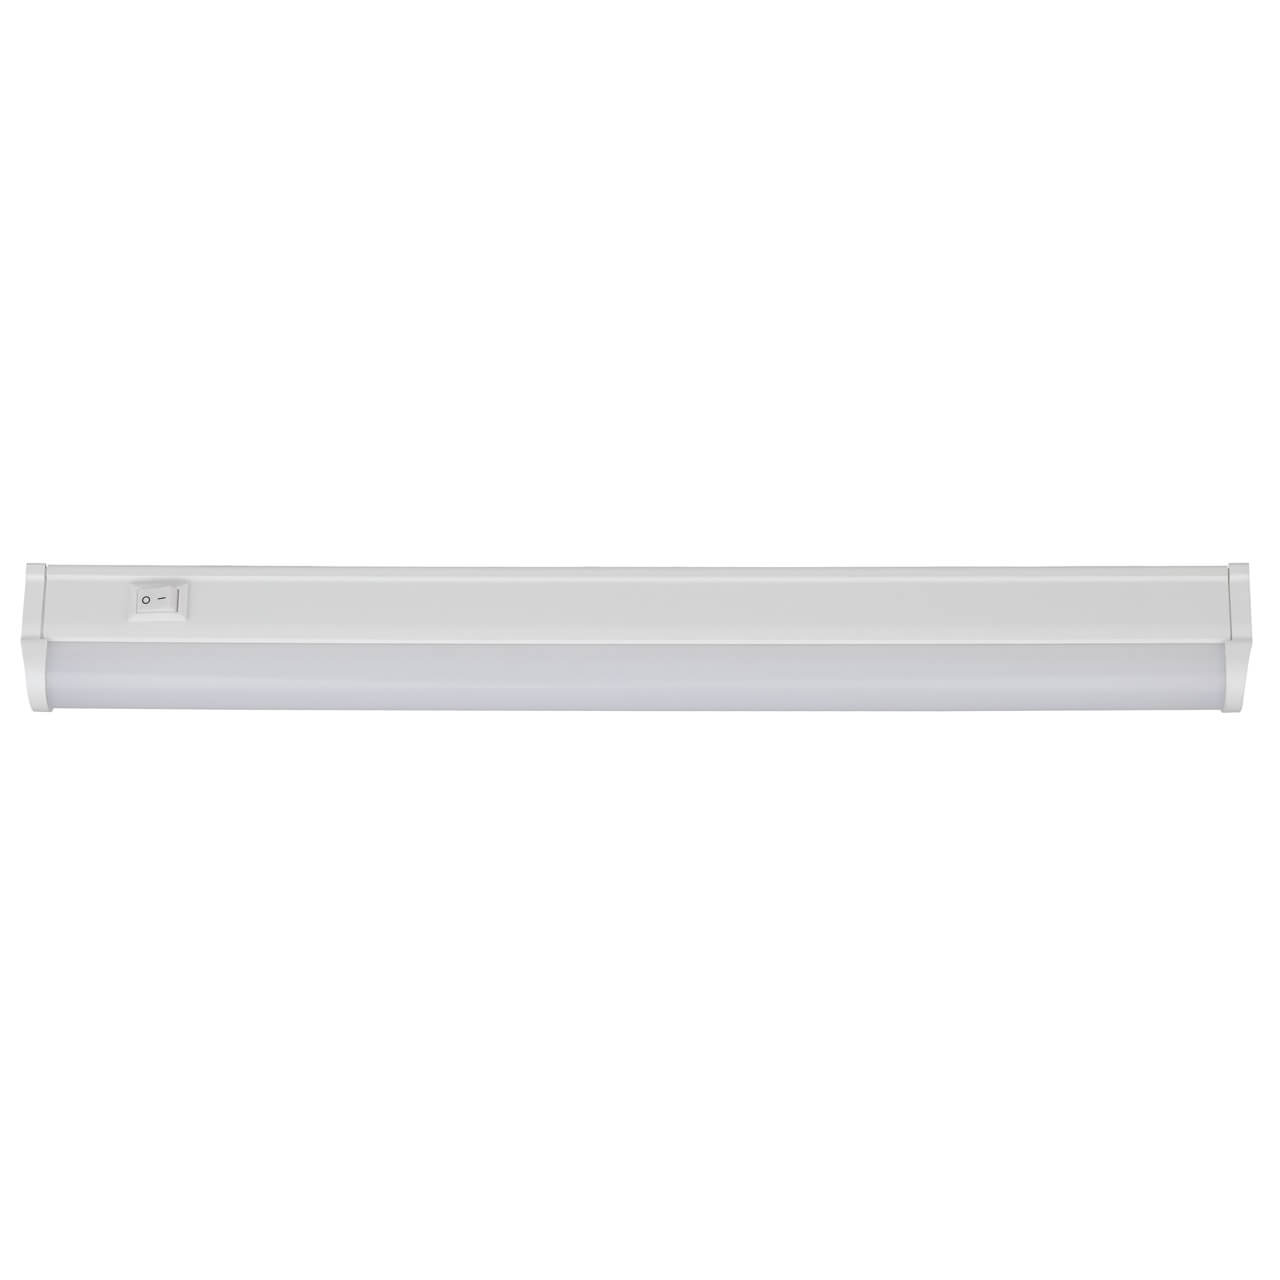 цена на Настенно-потолочный светильник ЭРА LLED-01-04W-6500-W